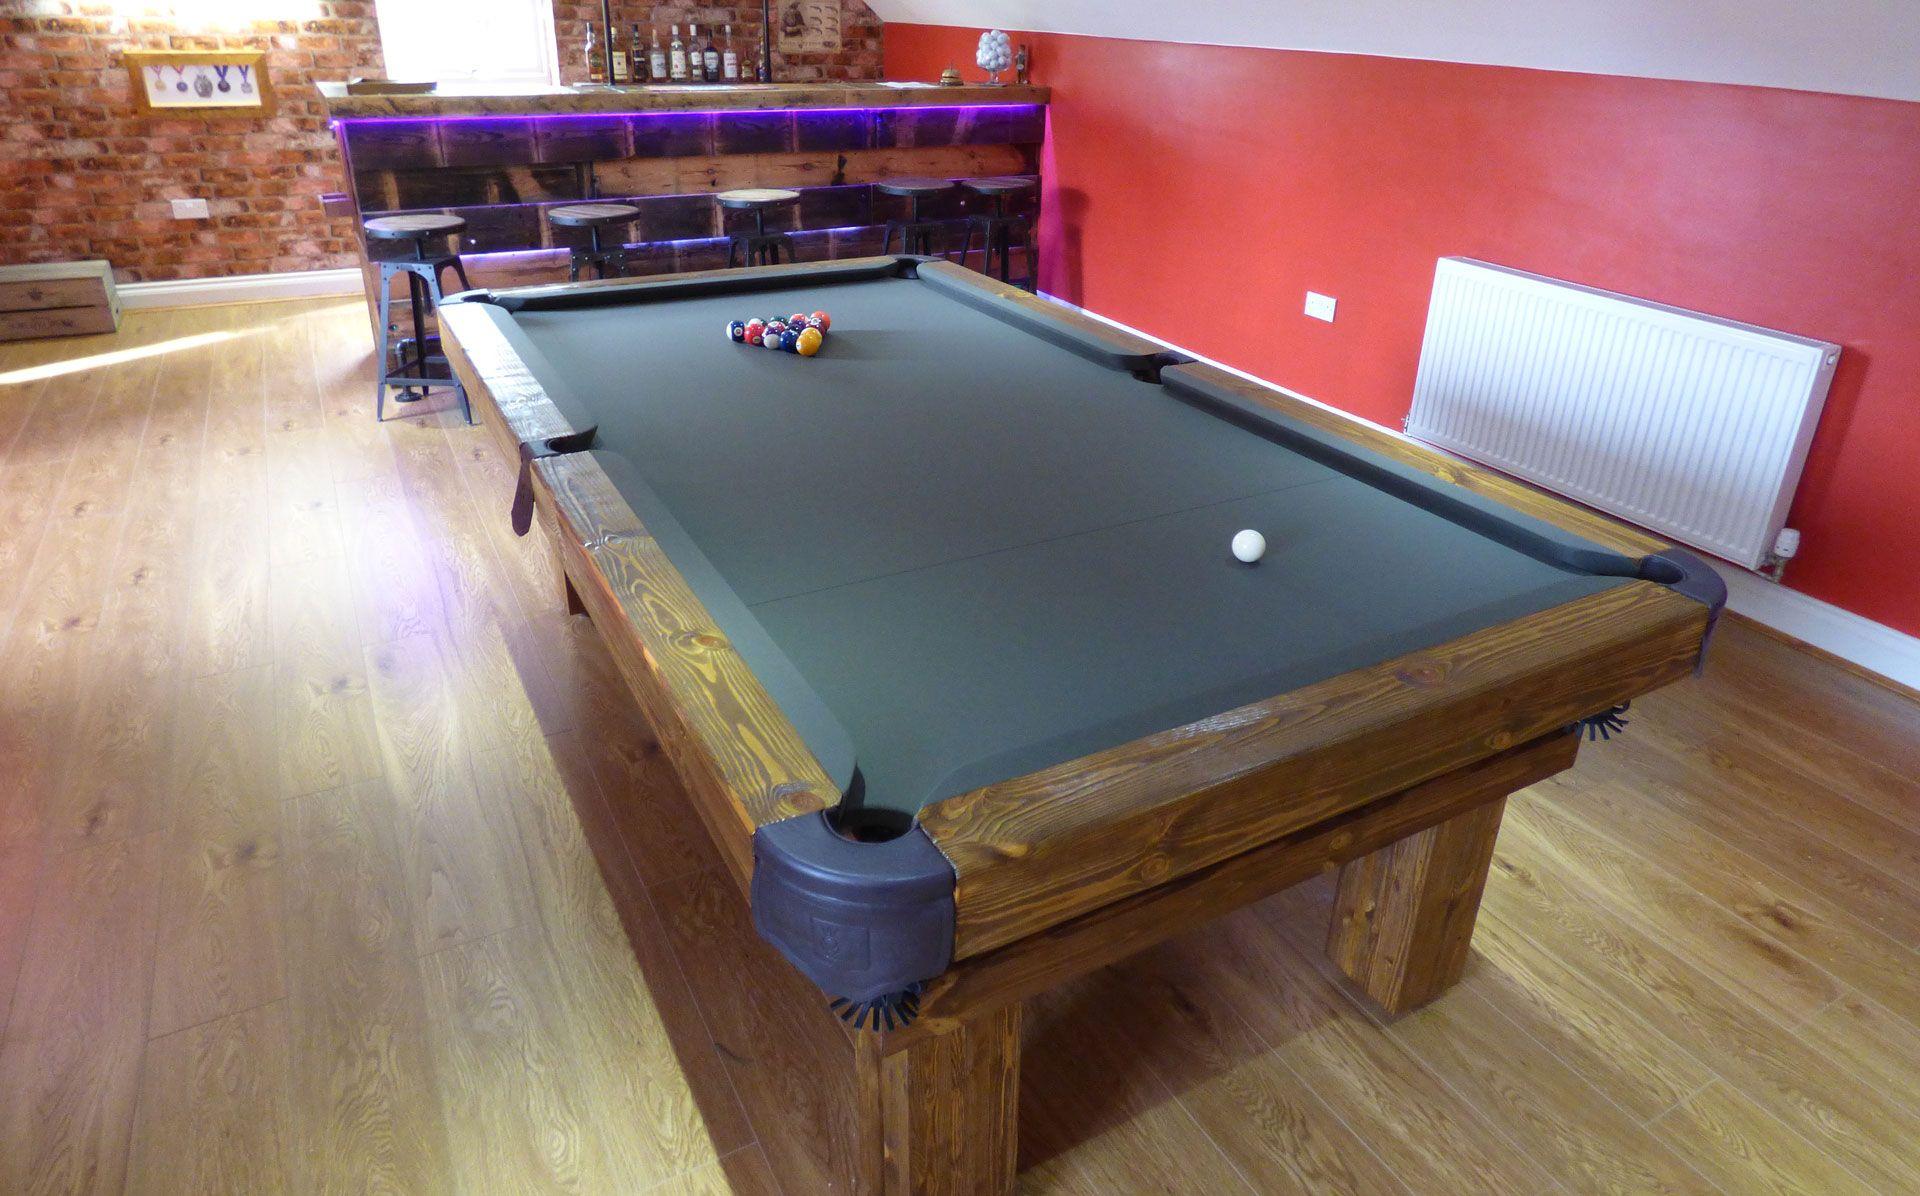 8u0027 English Rustic Pool Table, With Soft Wood Colour #6, Simonis Olive